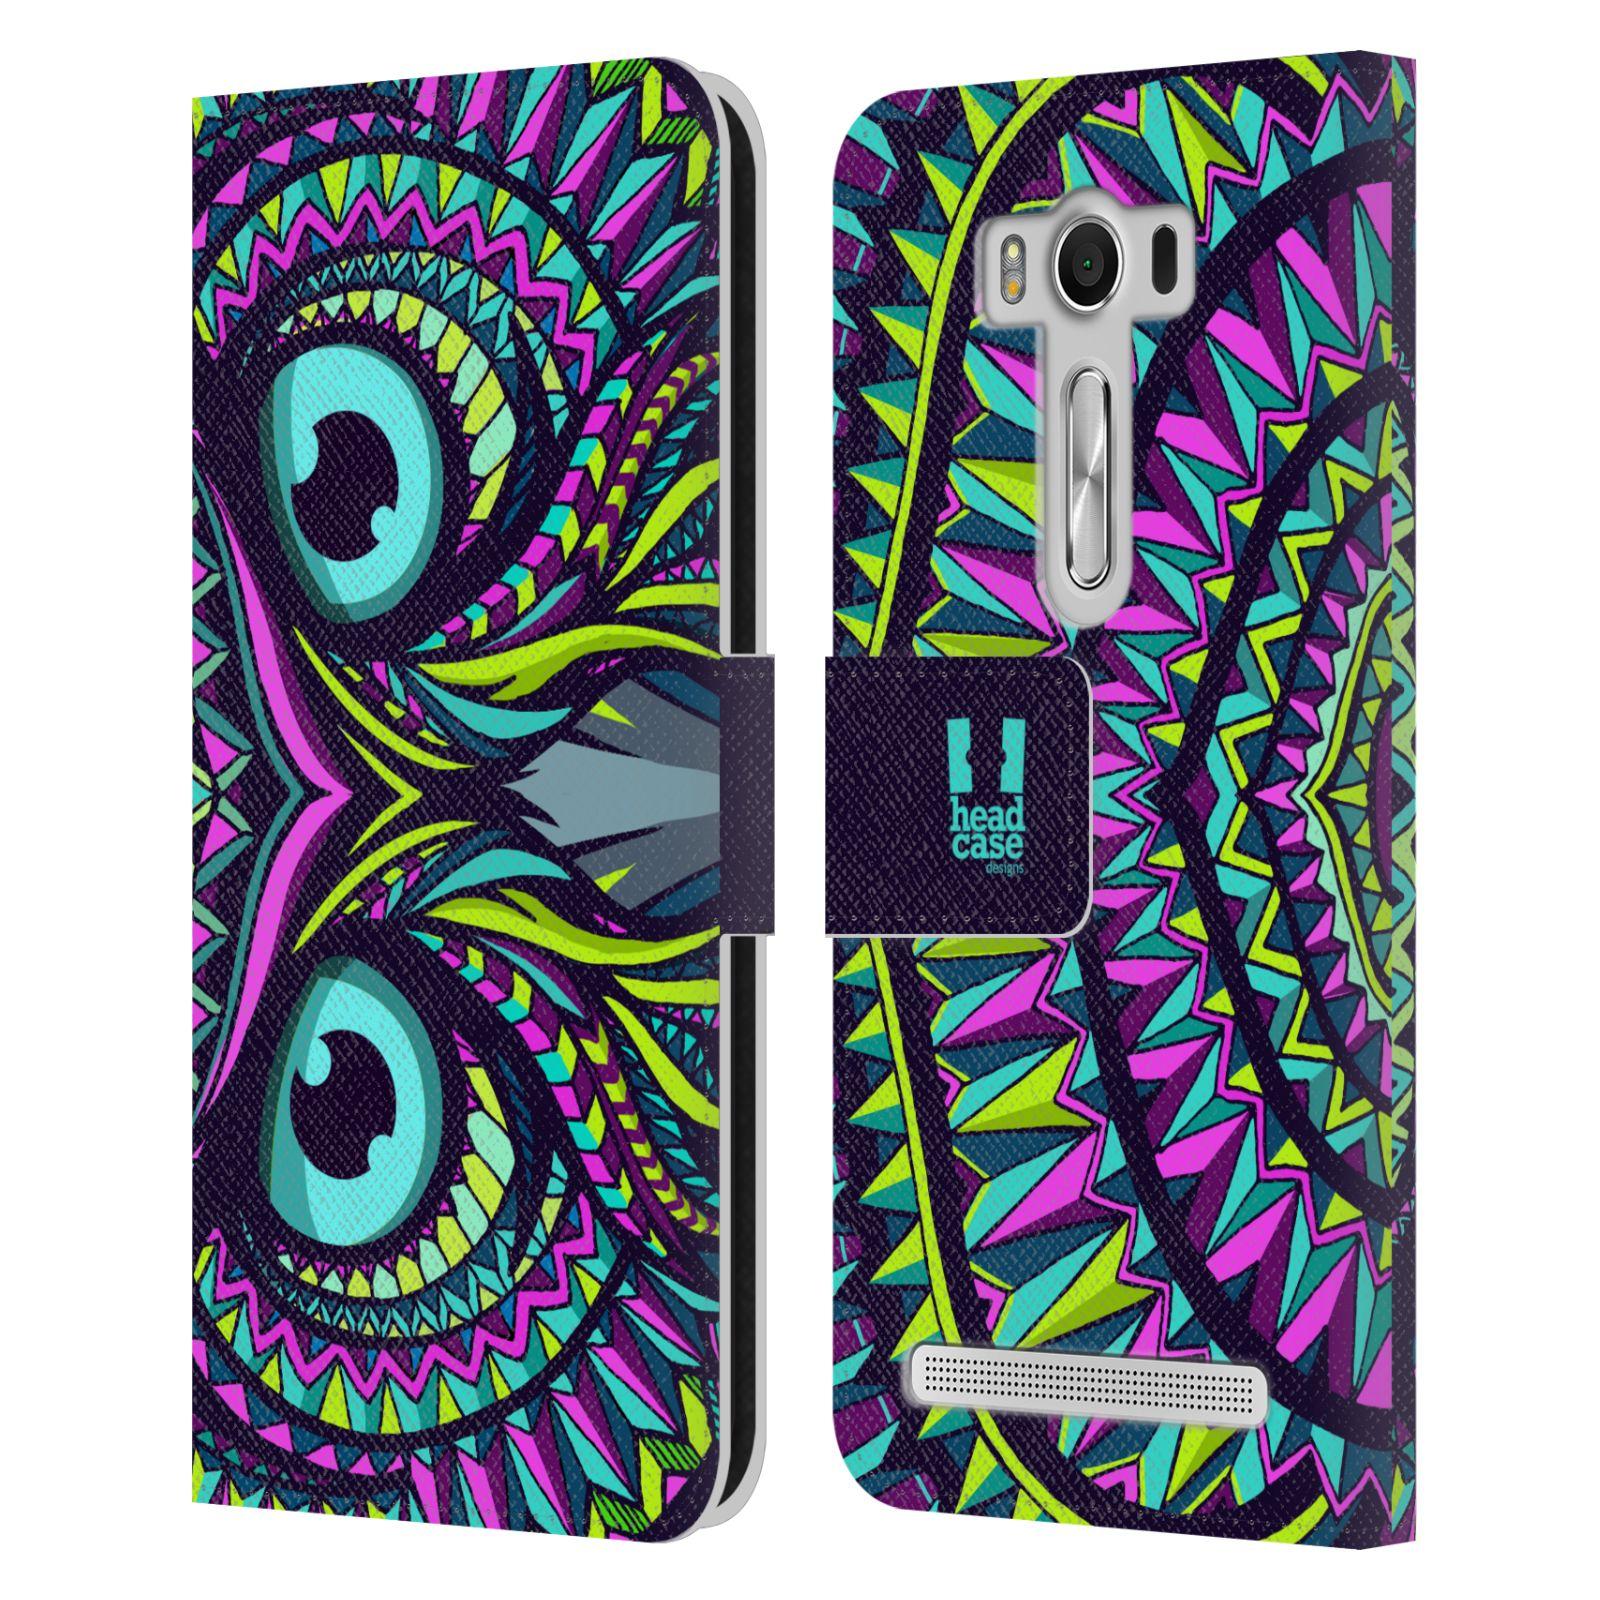 Pouzdro na mobil Asus Zenfone 2 Laser ZE500KL - Head Case - Aztécký vzor sova